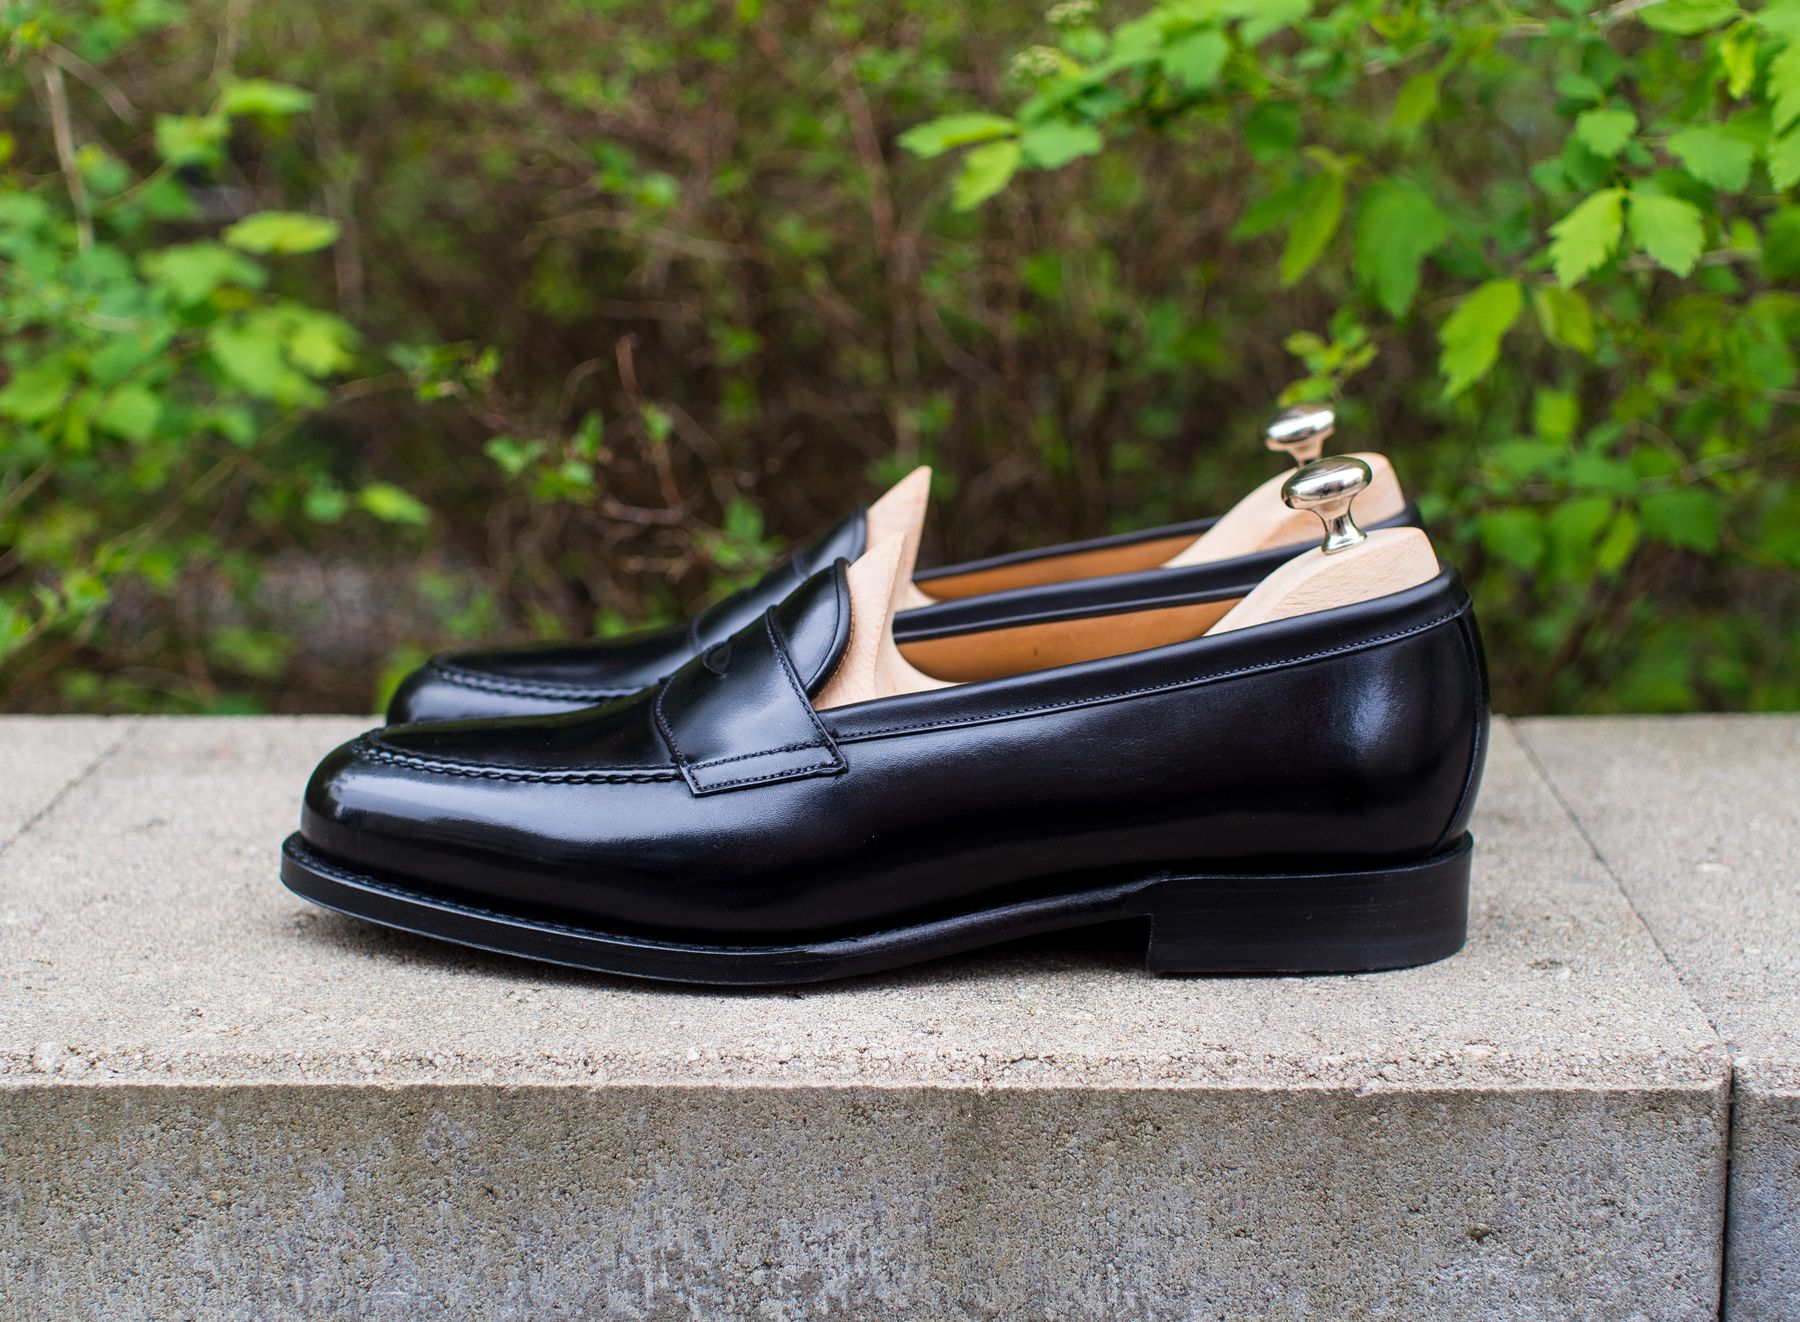 fashion mens comforter women rubie dress elegant spirit of graphics fresh shoes easy most comfortable for leather